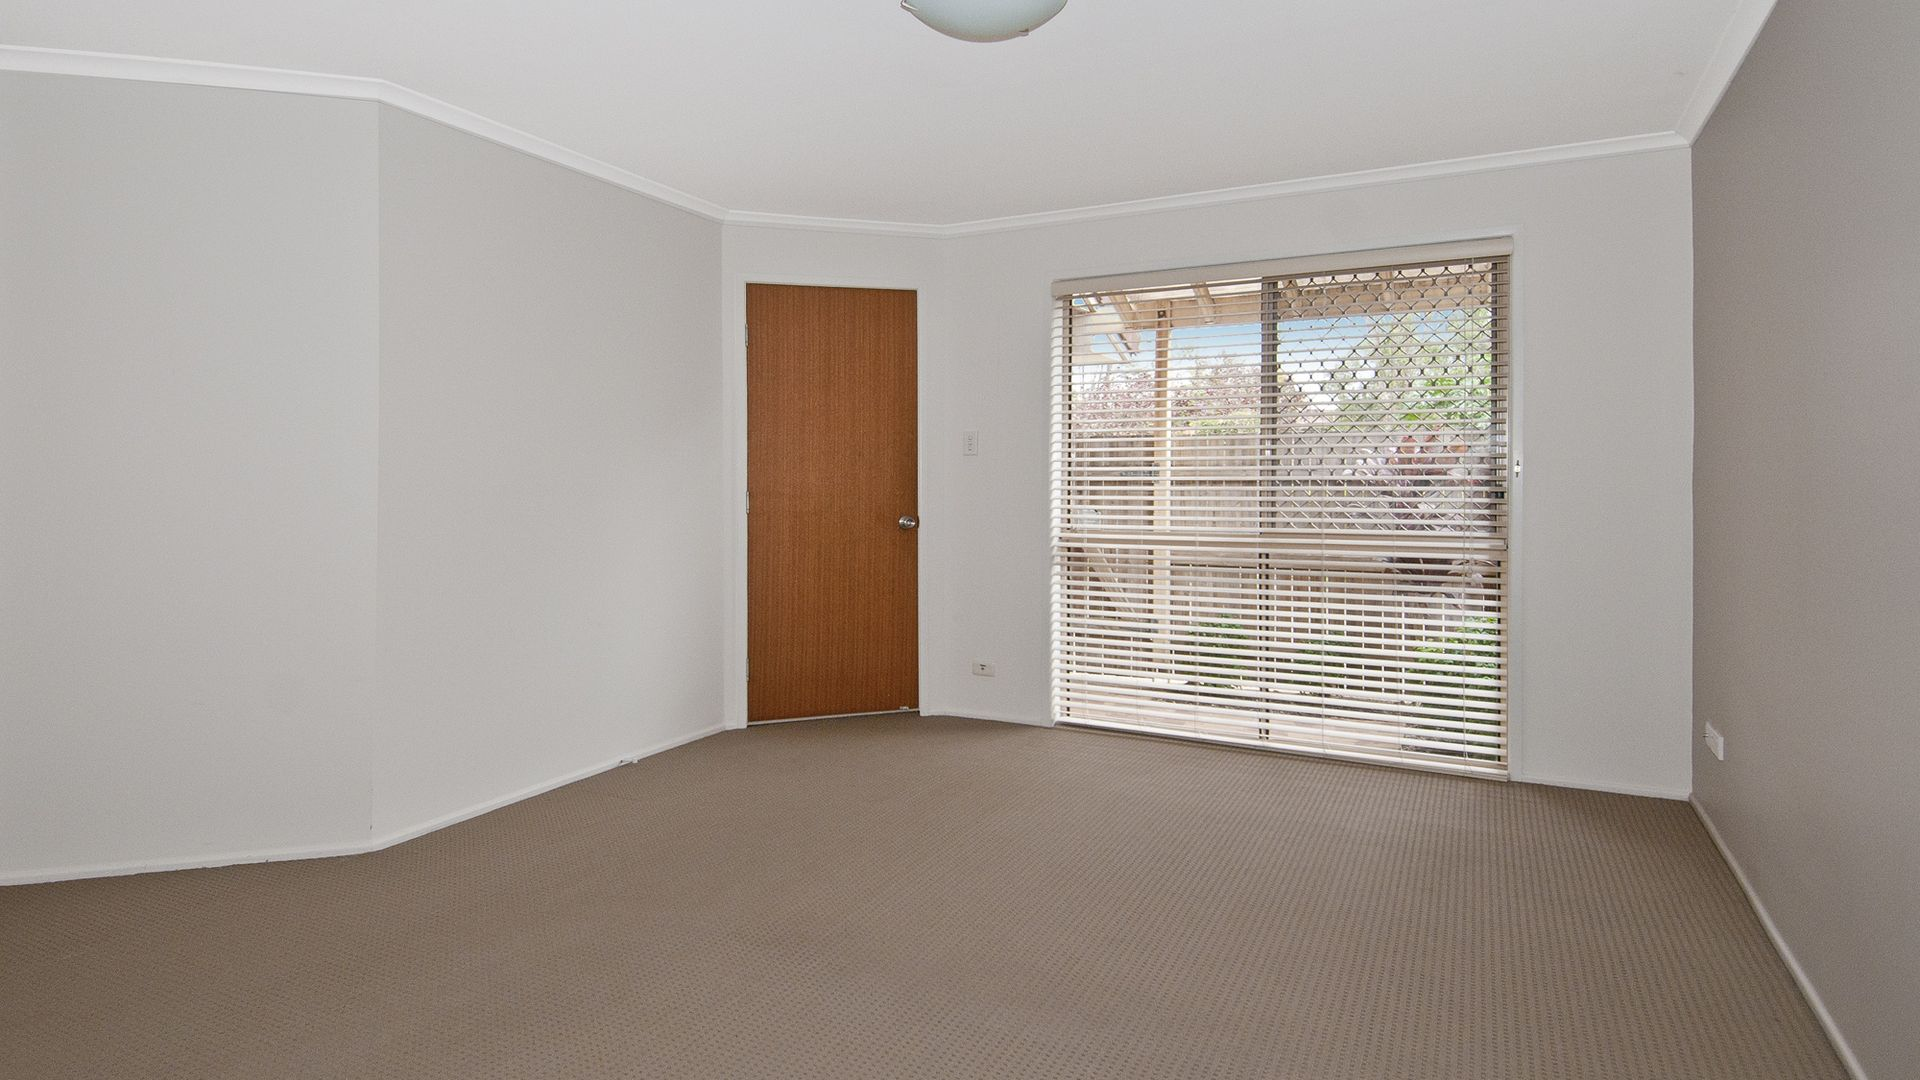 3/406 Chatswood Rd, Shailer Park QLD 4128, Image 2